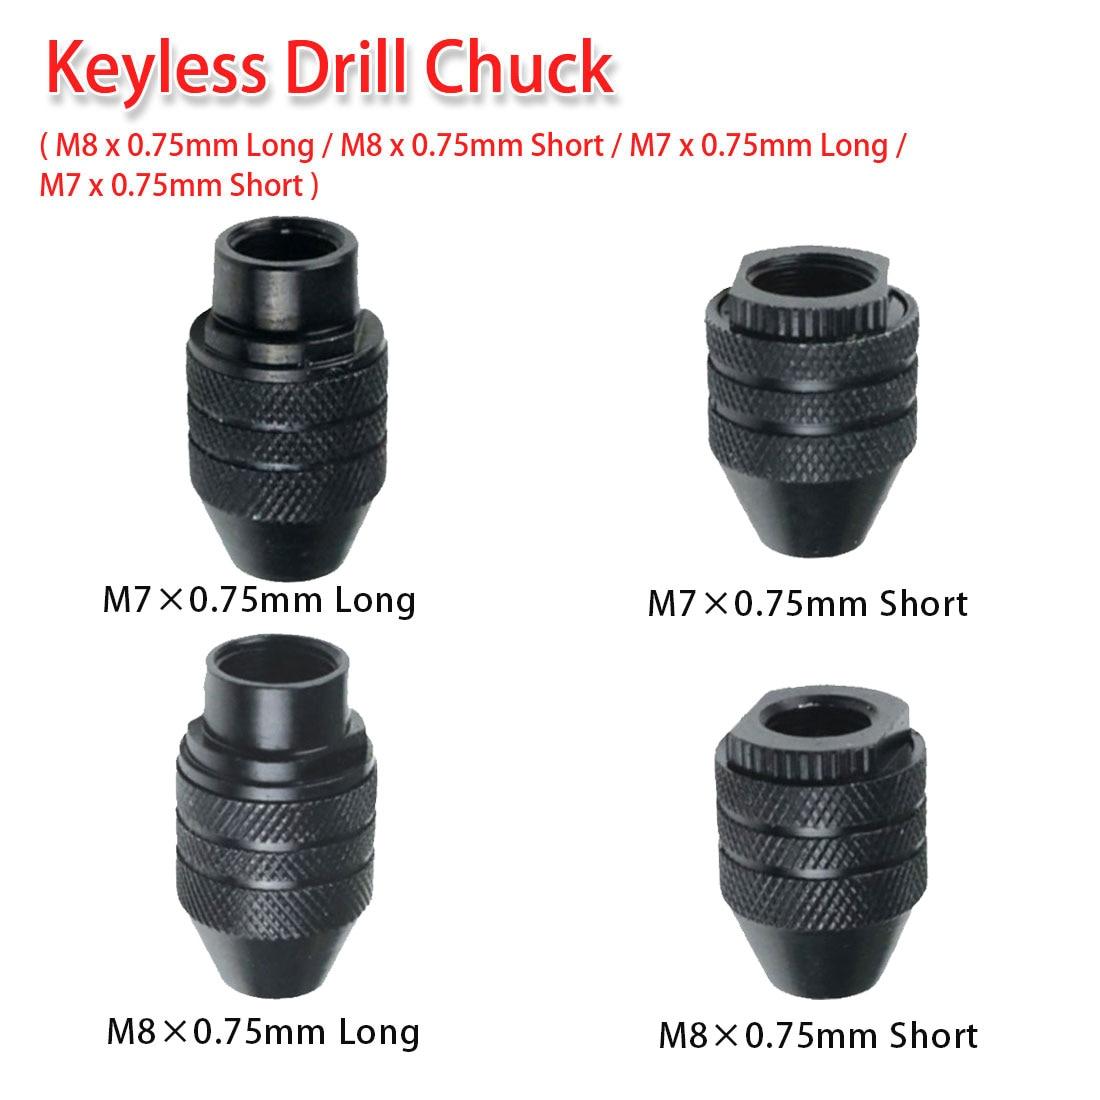 M8x0.75mm/ M7x0.75mm Keyless Drill Chuck Thread 9/32-40 for Dremel 4000 3000 8200 Grinder Rotary Tool 0.5-3.2mm Flexible Shaft